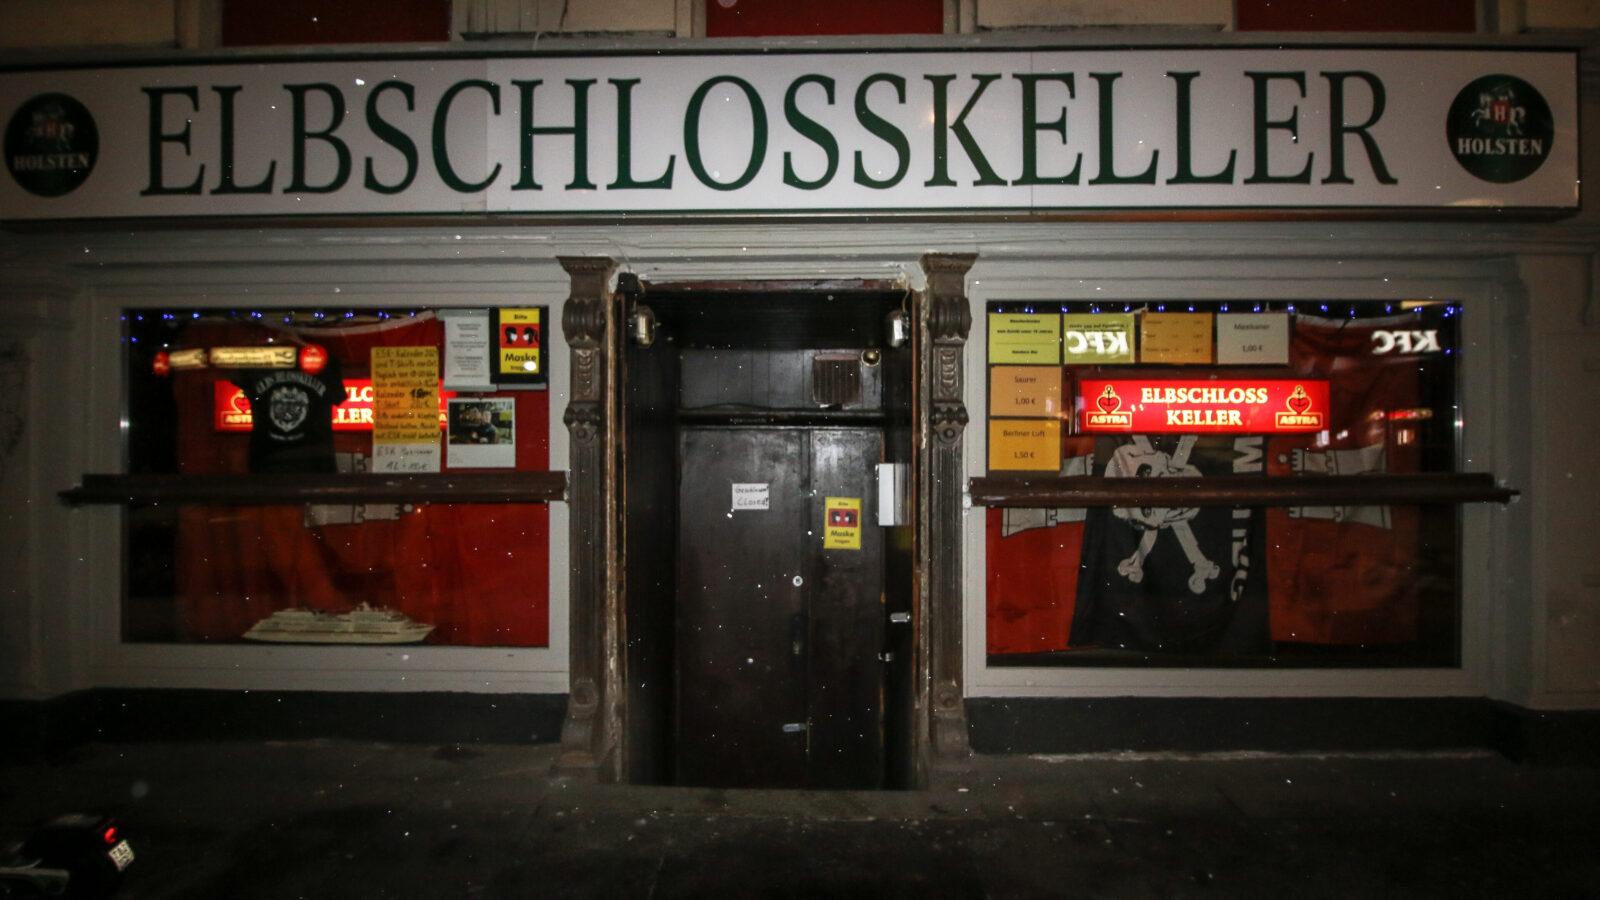 Der Hamburger Berg im Winter / Lockdown 2